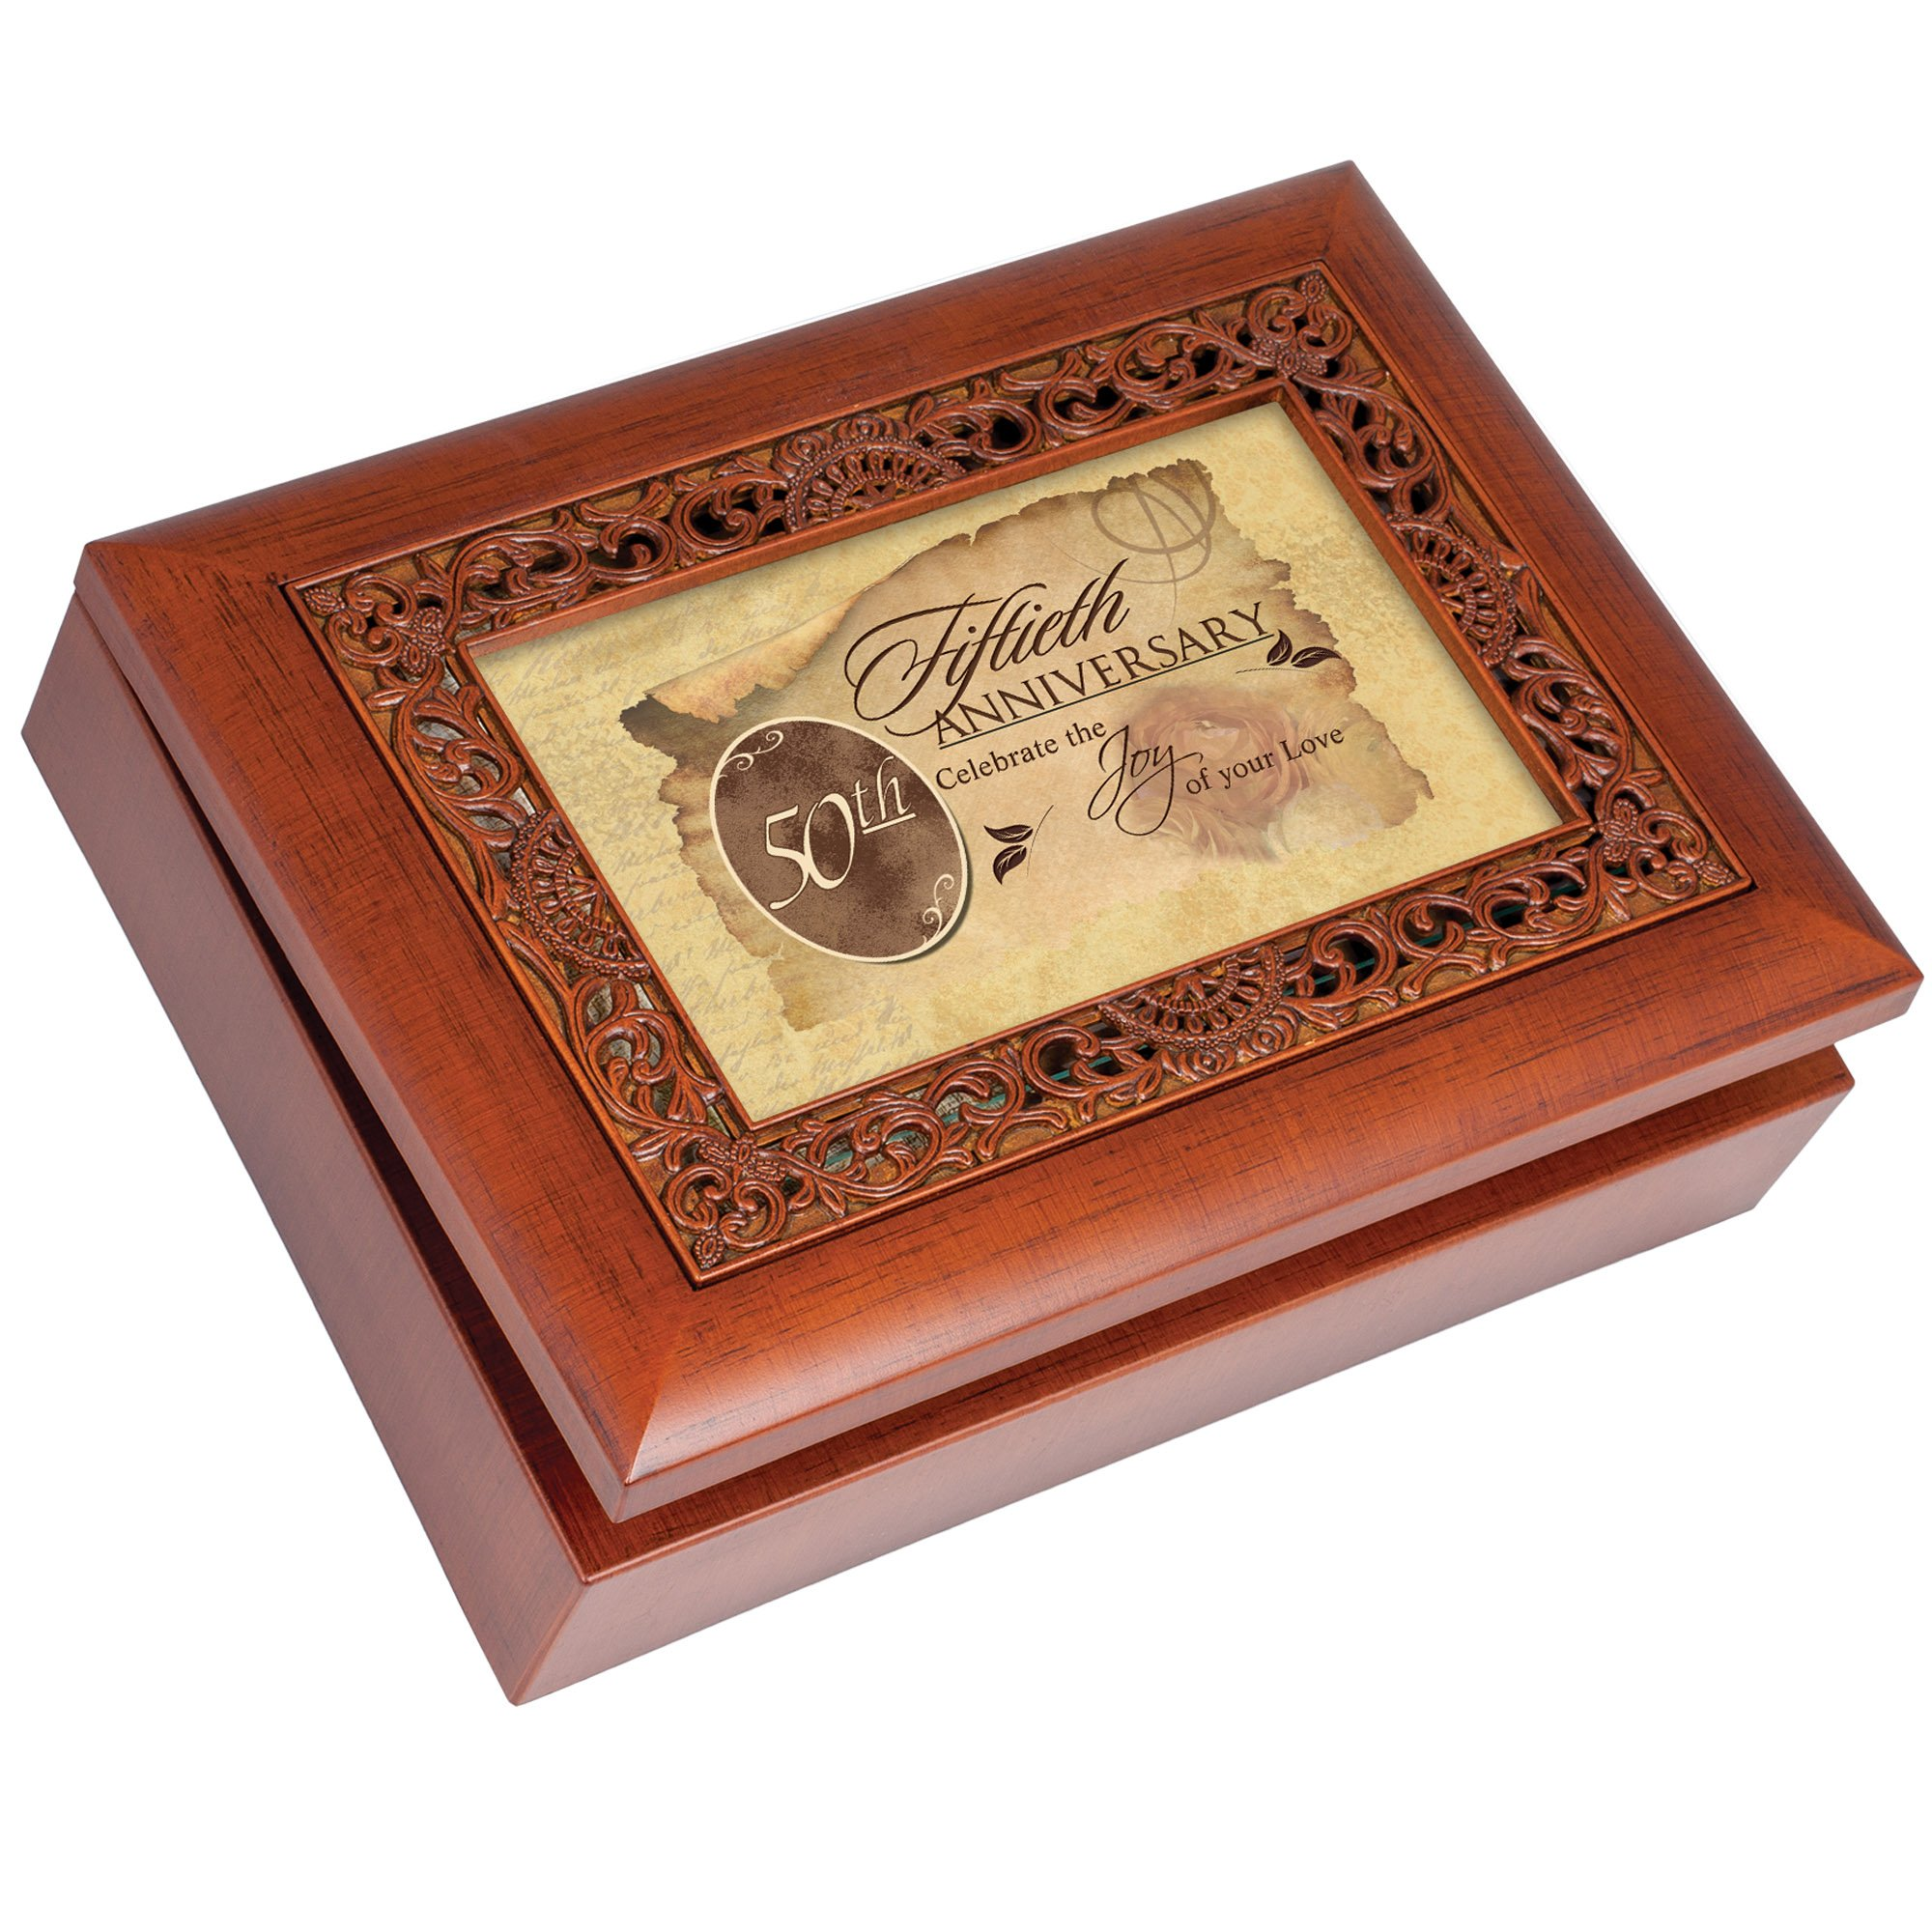 Cottage Garden 50th Anniversary Woodgrain Inlay Jewelry Music Box Plays Light Up My Life